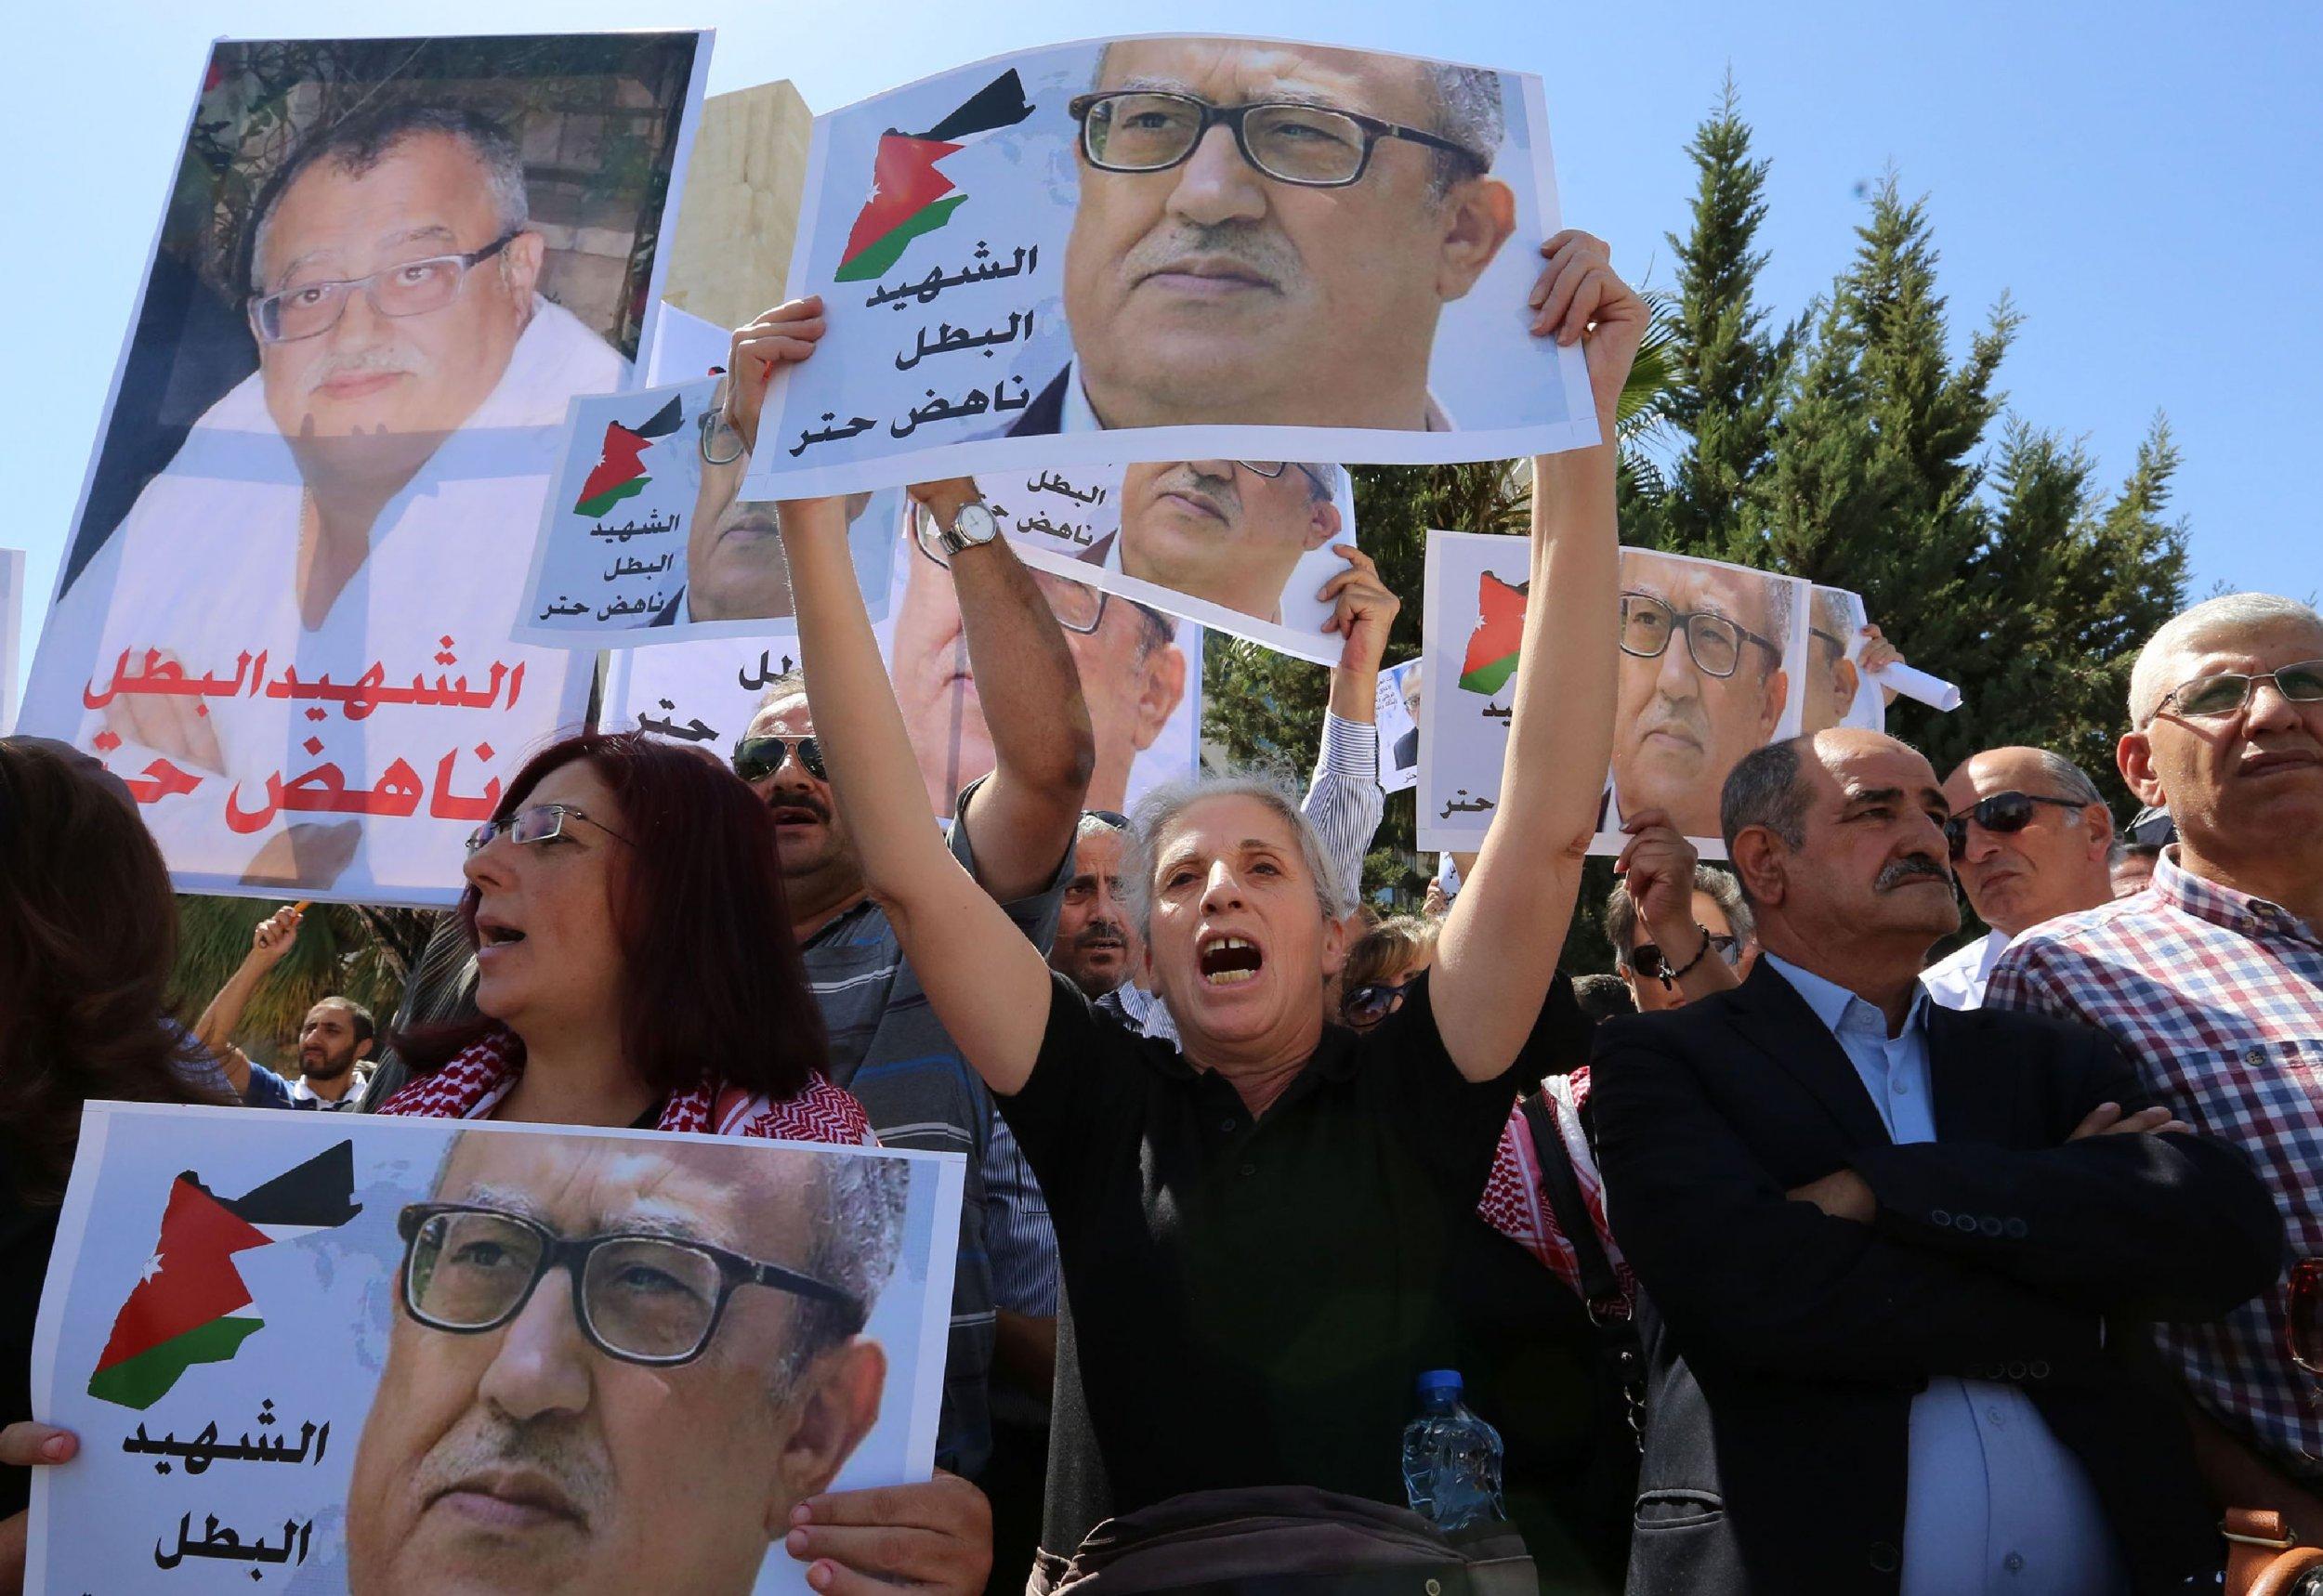 Jordanians protest the death of Nahed Hattar